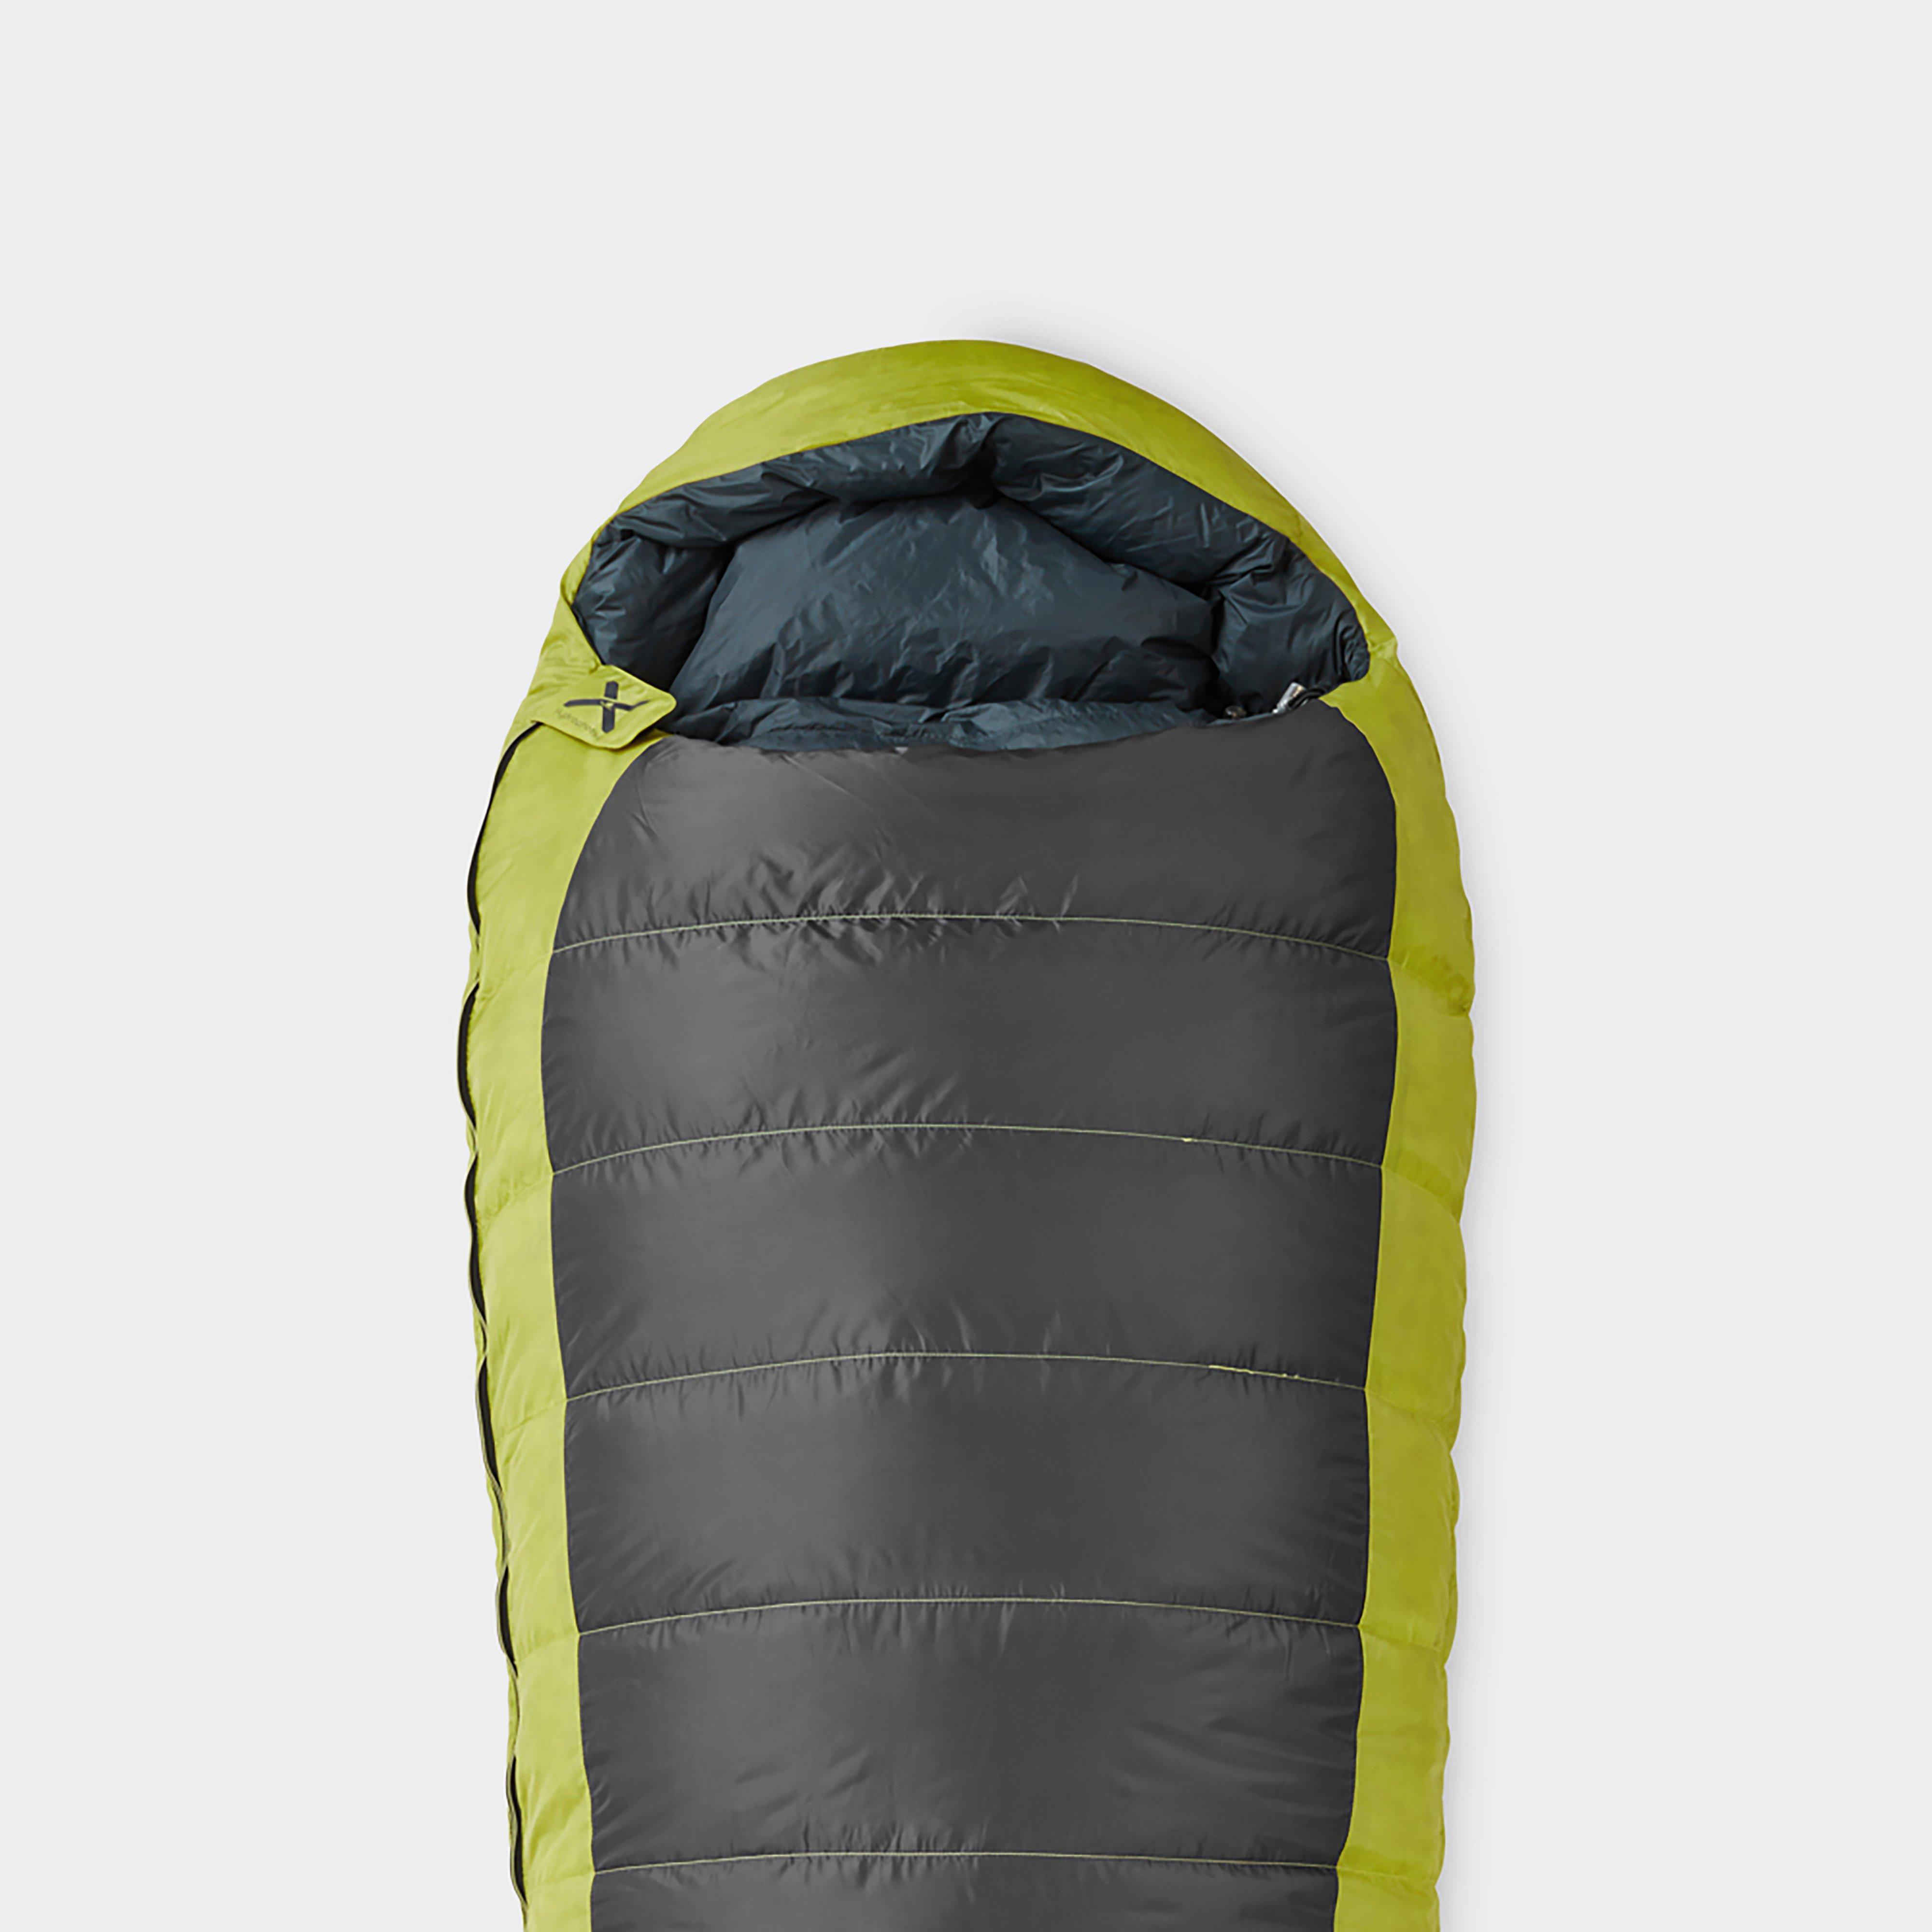 Oex Oex Leviathan EV 900 Sleeping Bag